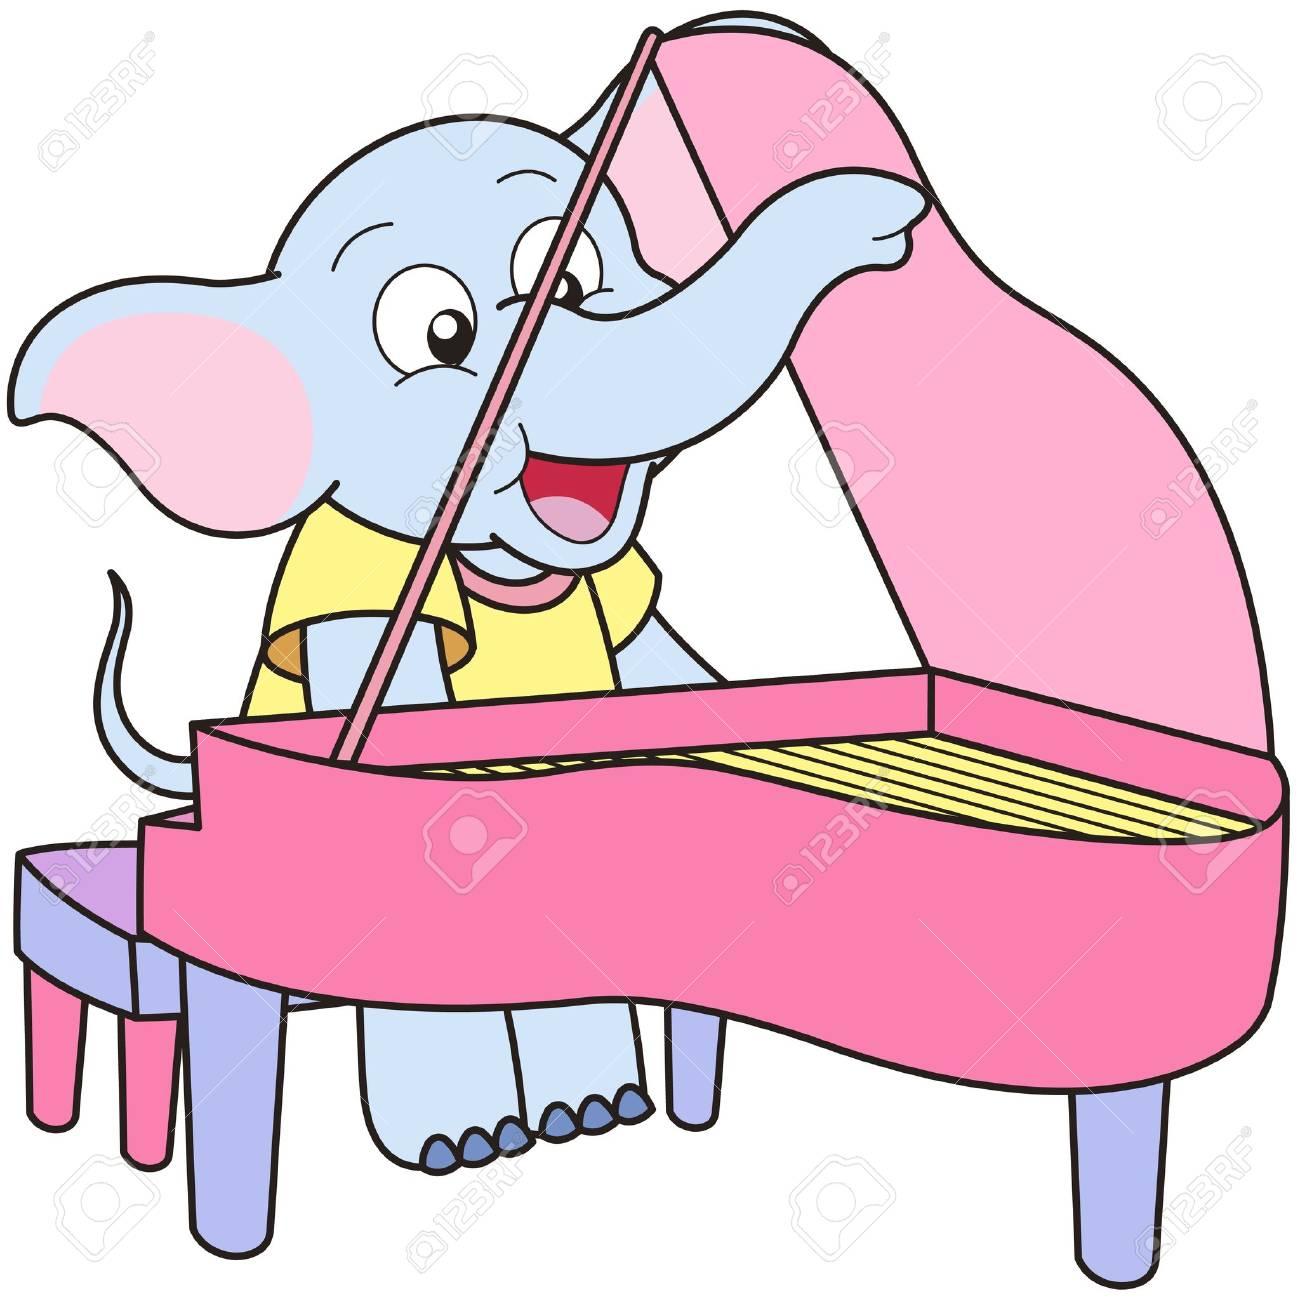 1300x1300 Cartoon Elephant Playing A Piano. Royalty Free Cliparts, Vectors